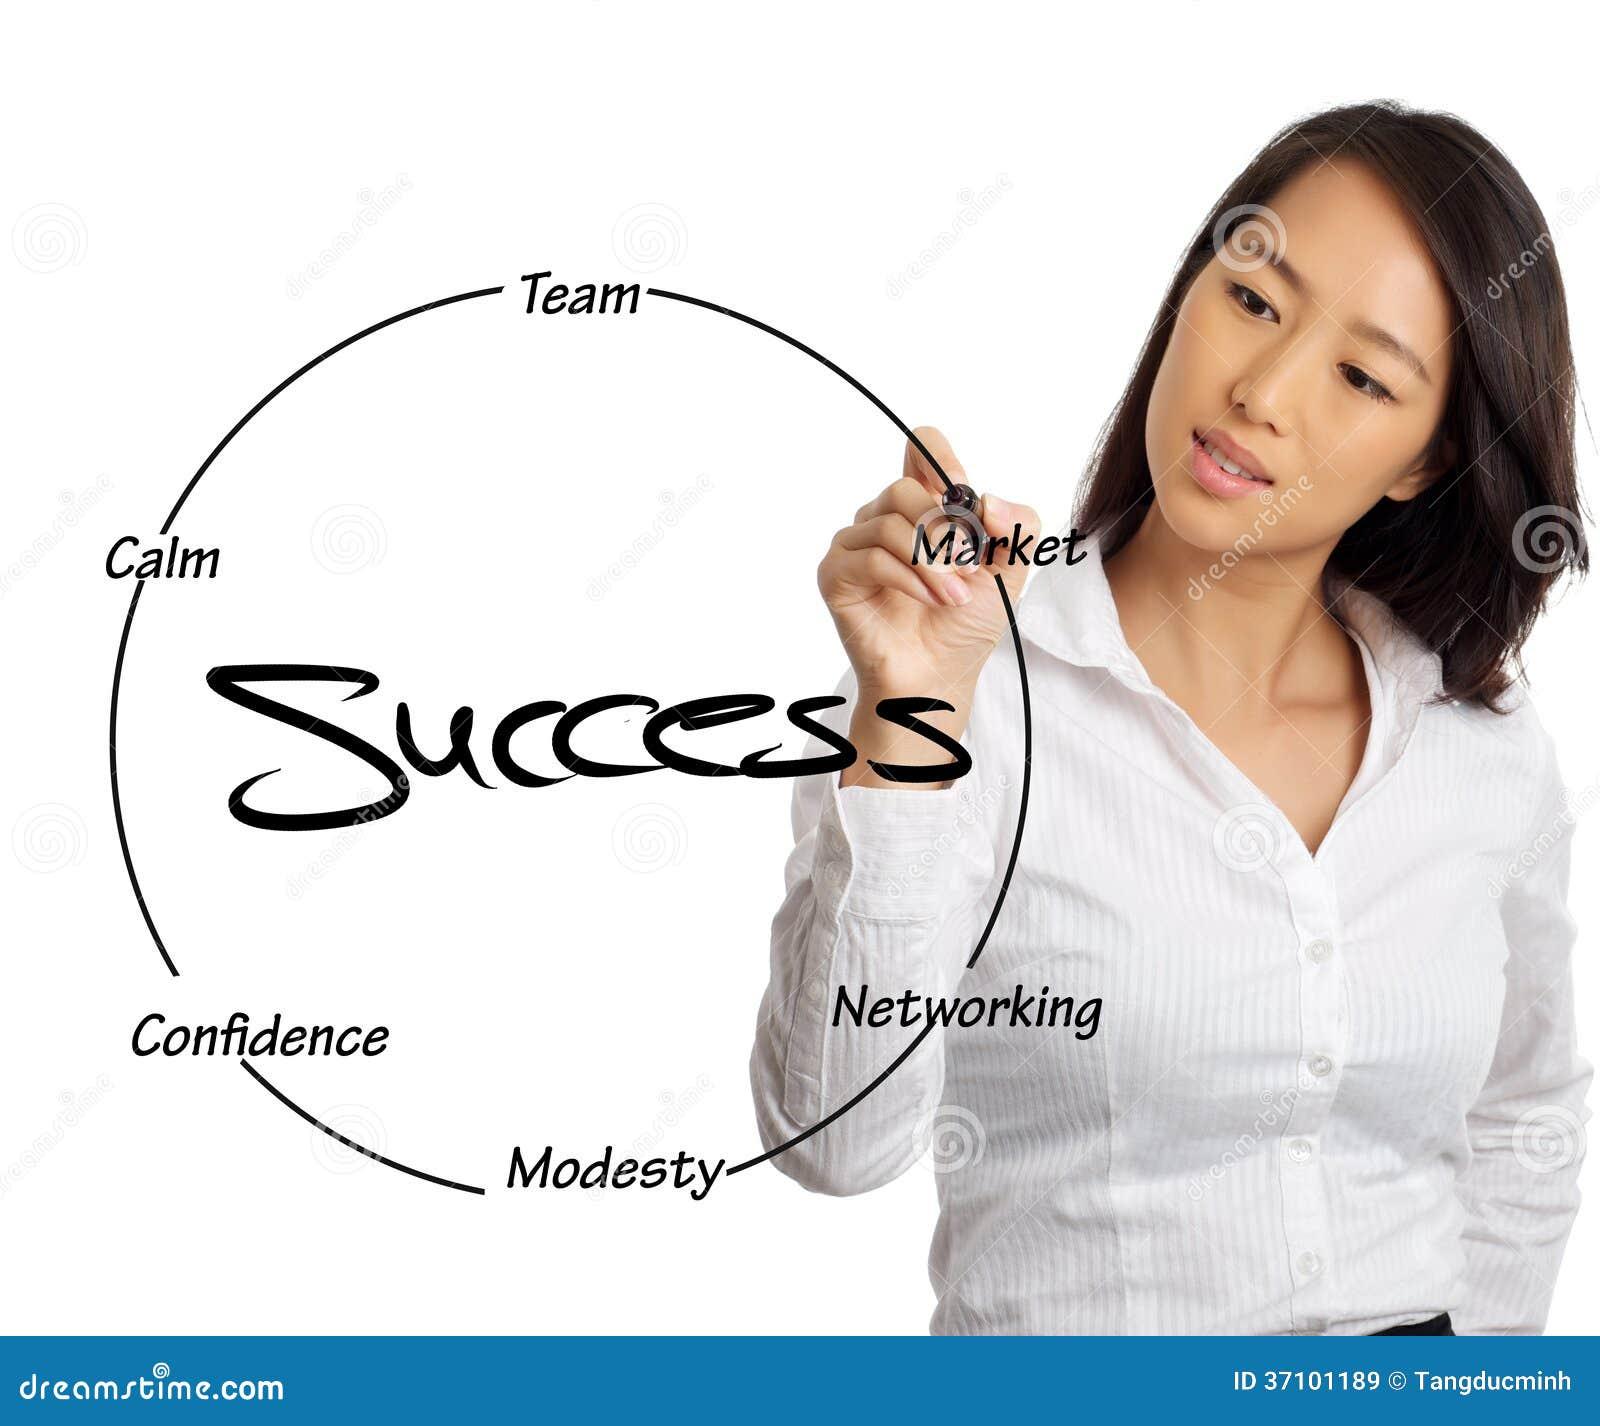 asia business council essay We provide excellent essay writing service 24/7 enjoy proficient essay writing and custom writing services provided by professional academic writers.